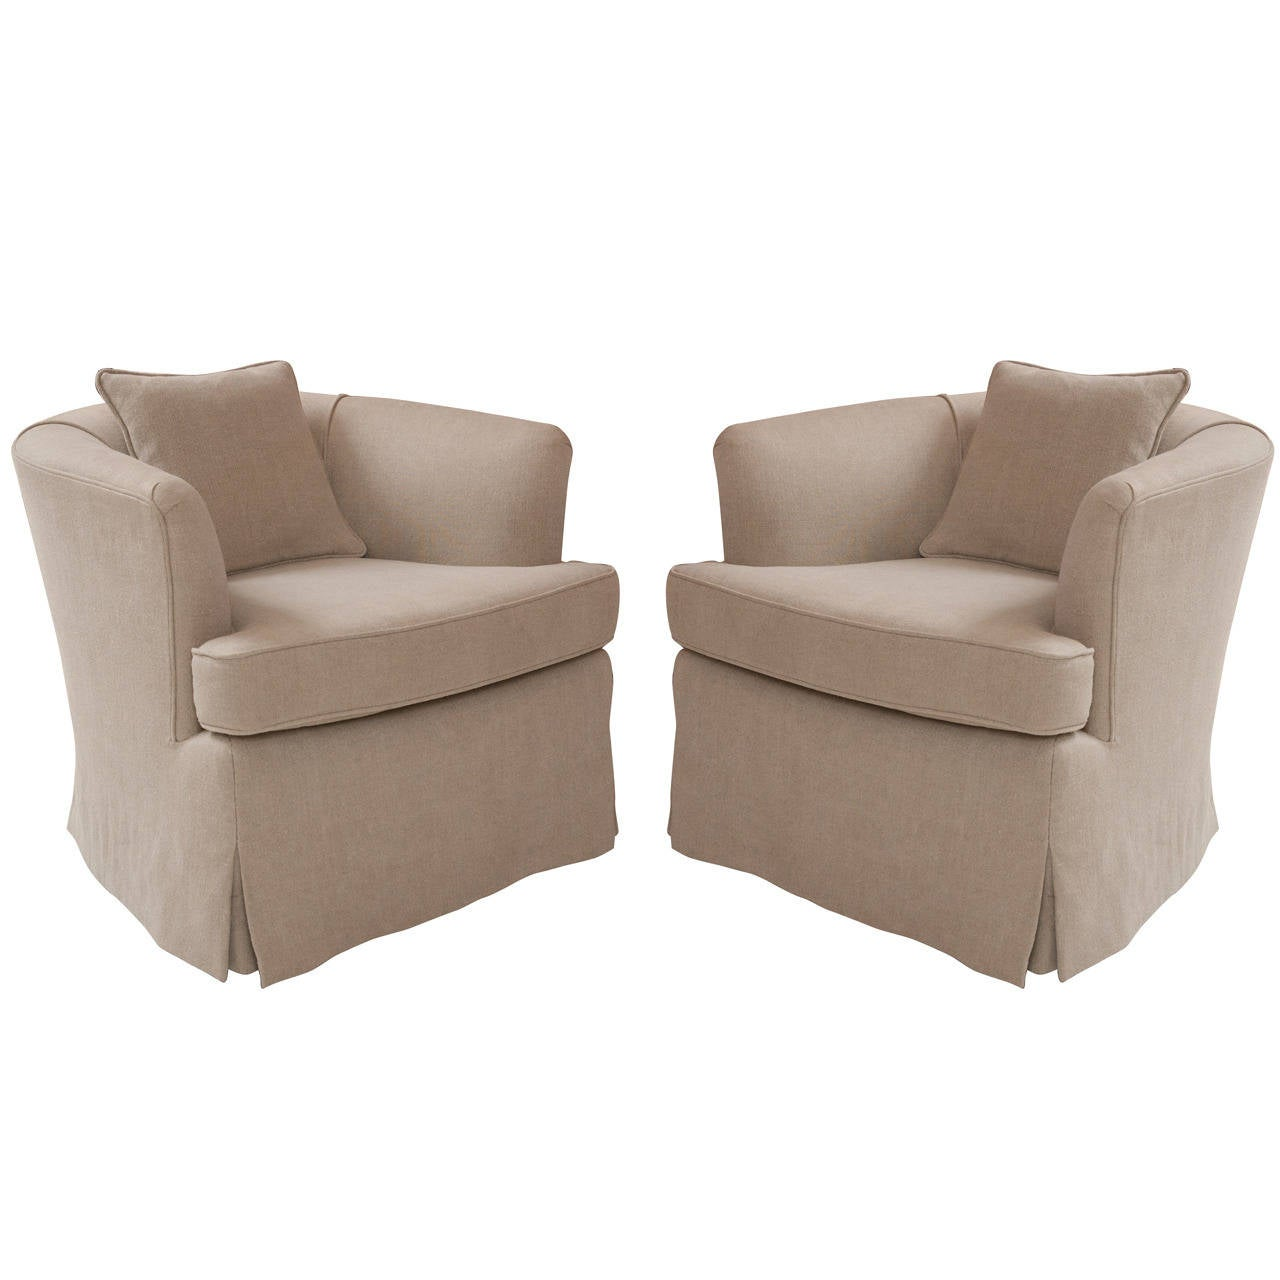 Pair Of Custom Linen Mid Century Swivel Club Chairs At 1stdibs